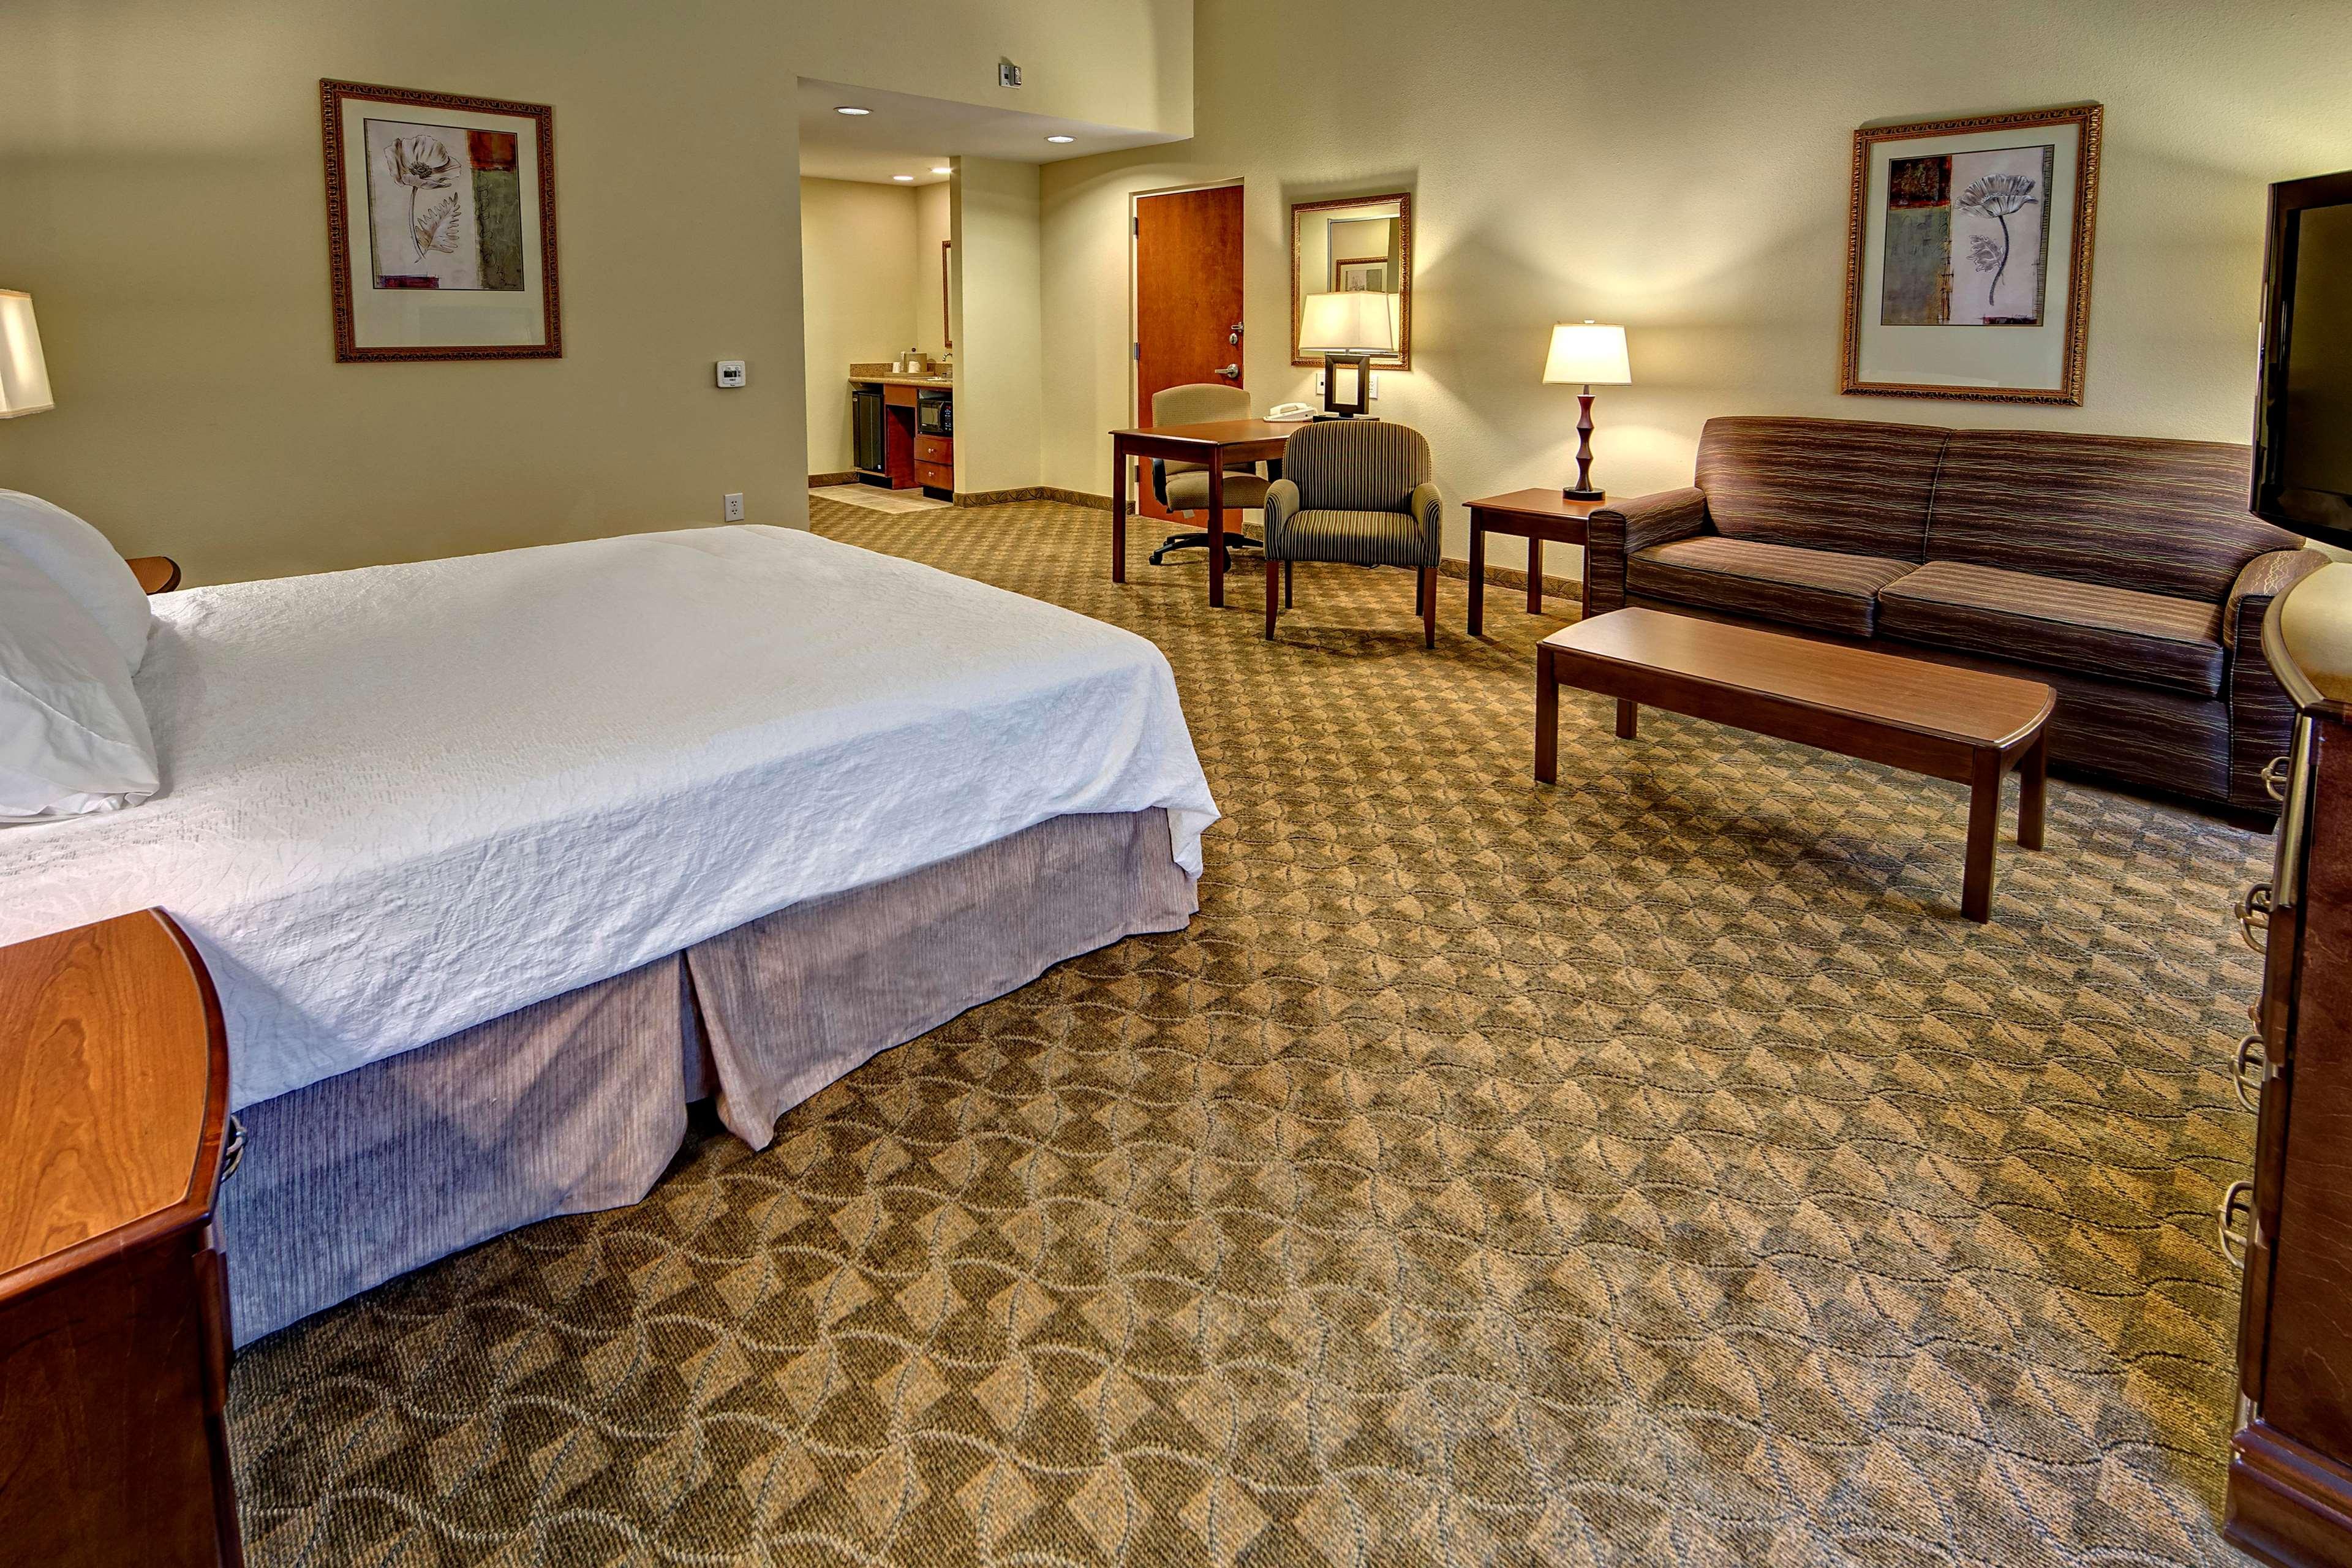 Hampton Inn & Suites Cashiers-Sapphire Valley image 41